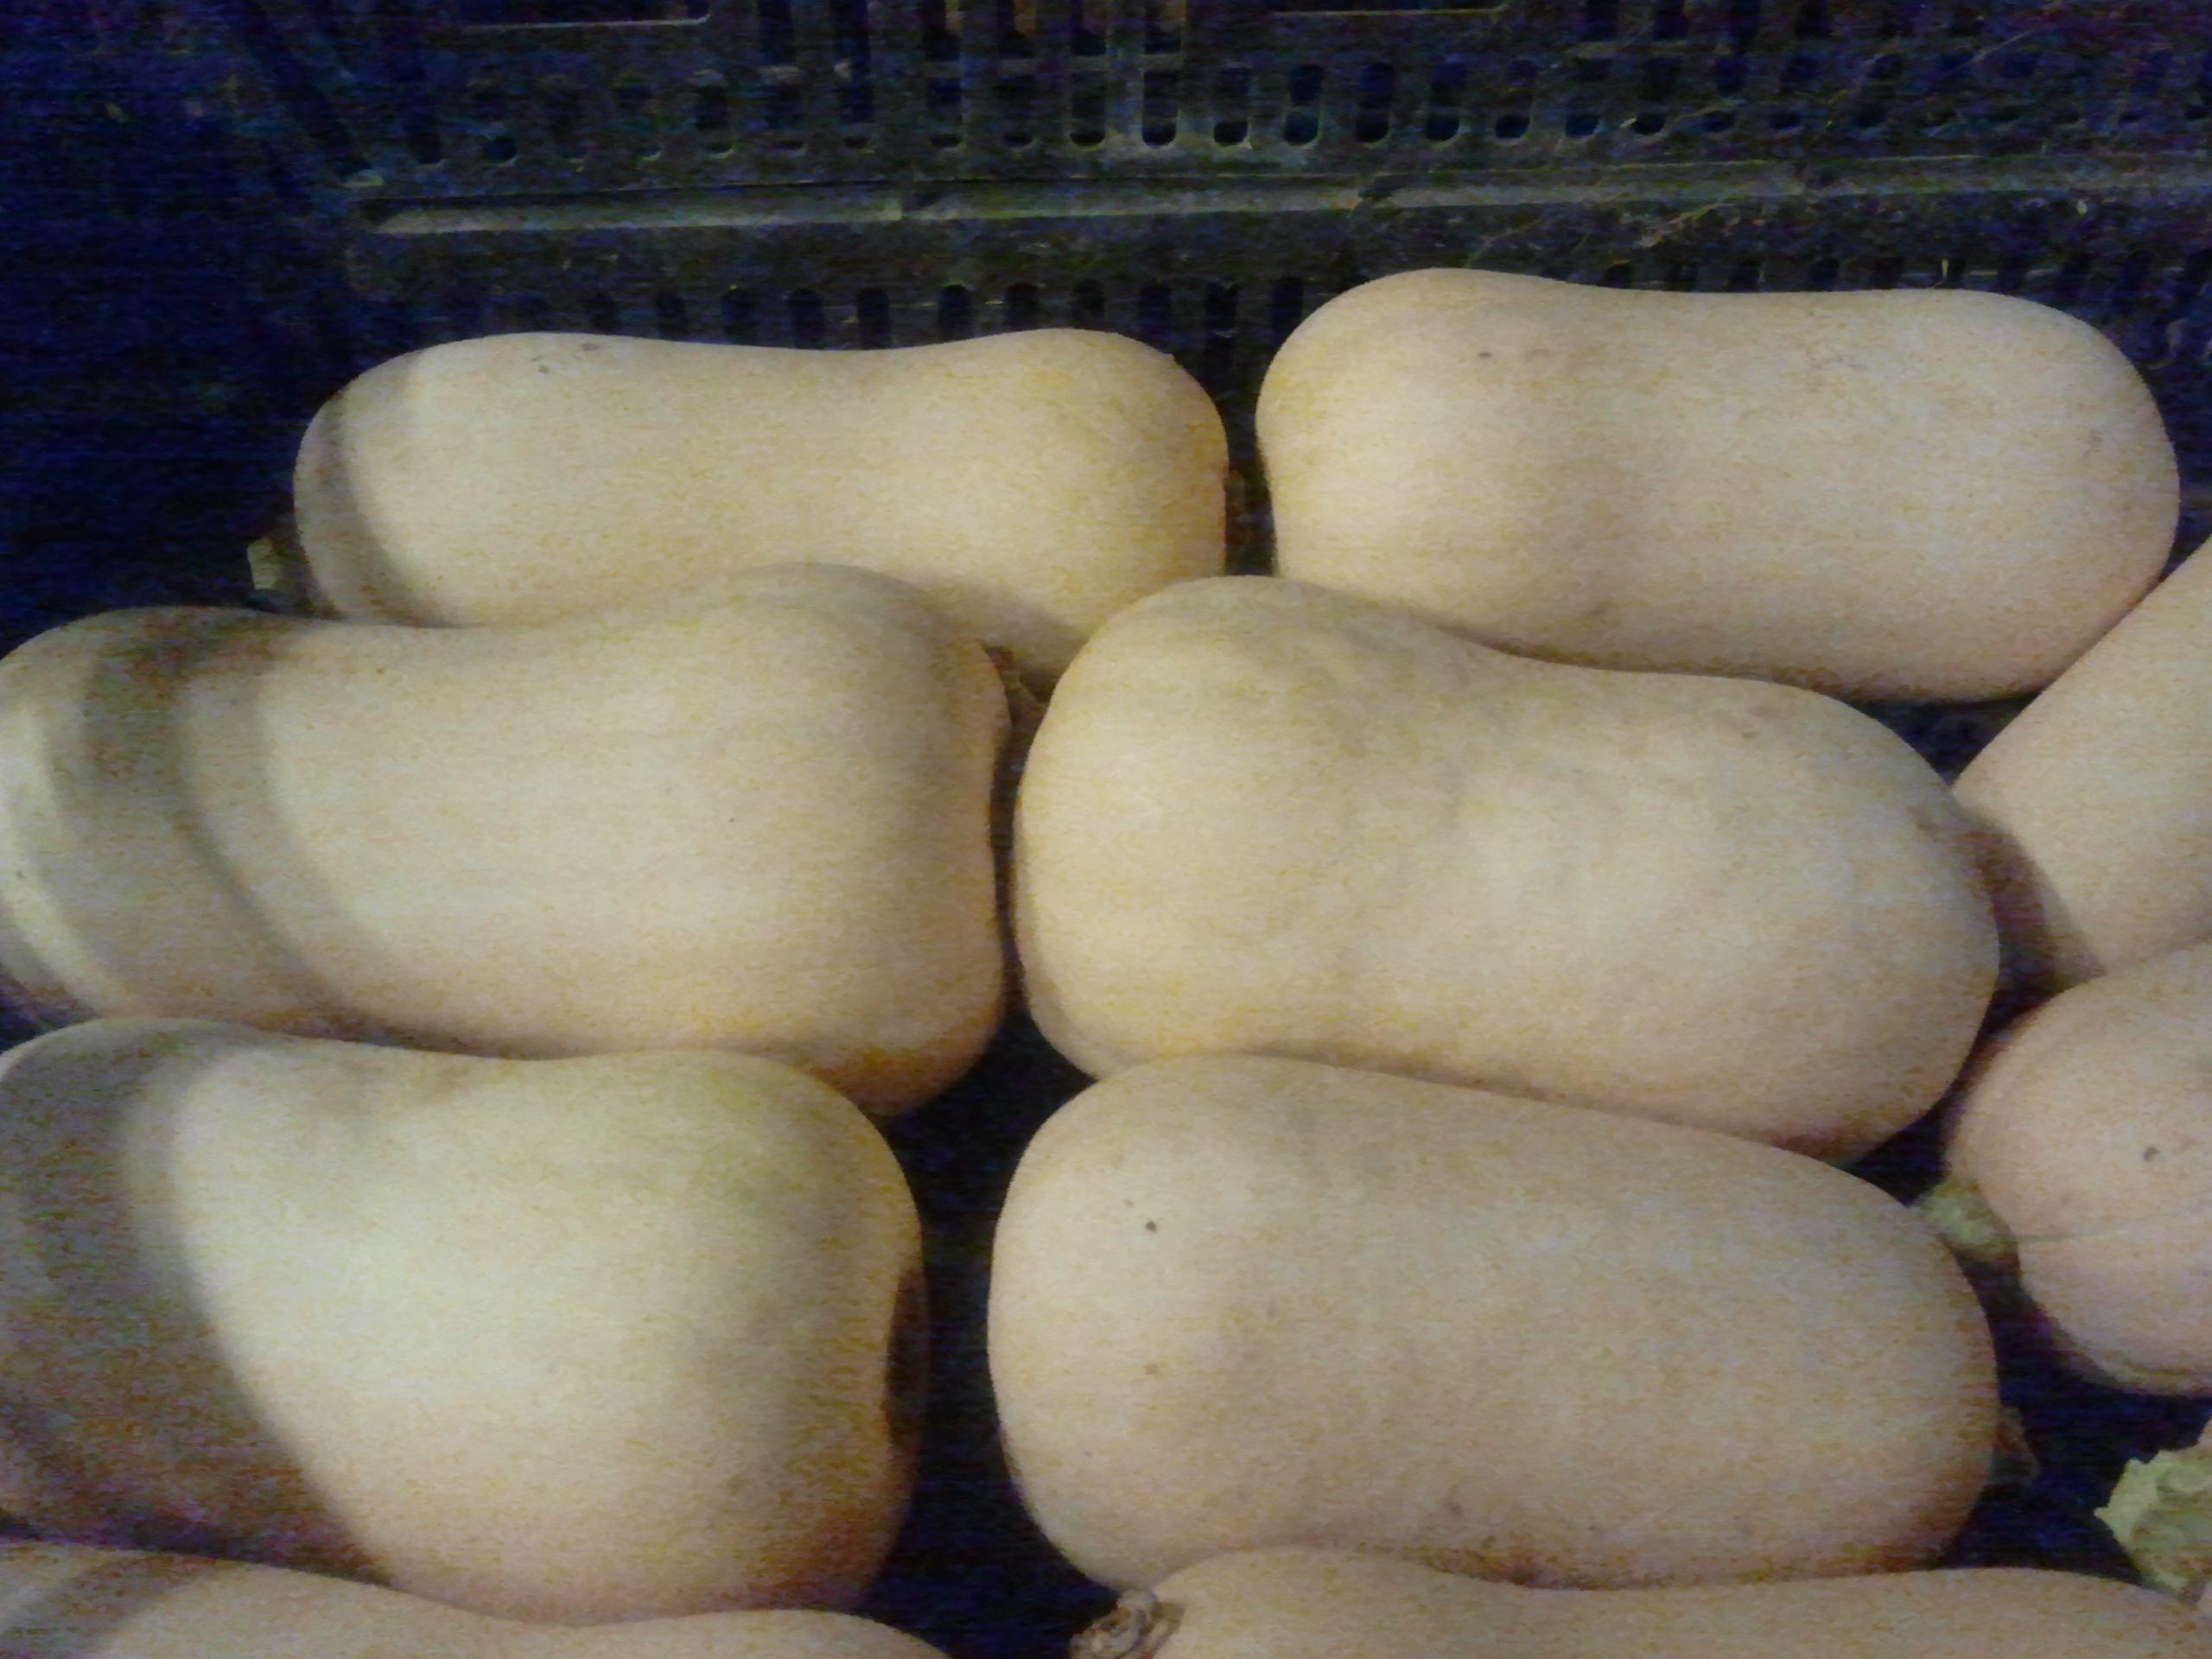 exportadores de calabaza cacahuete tipo squash